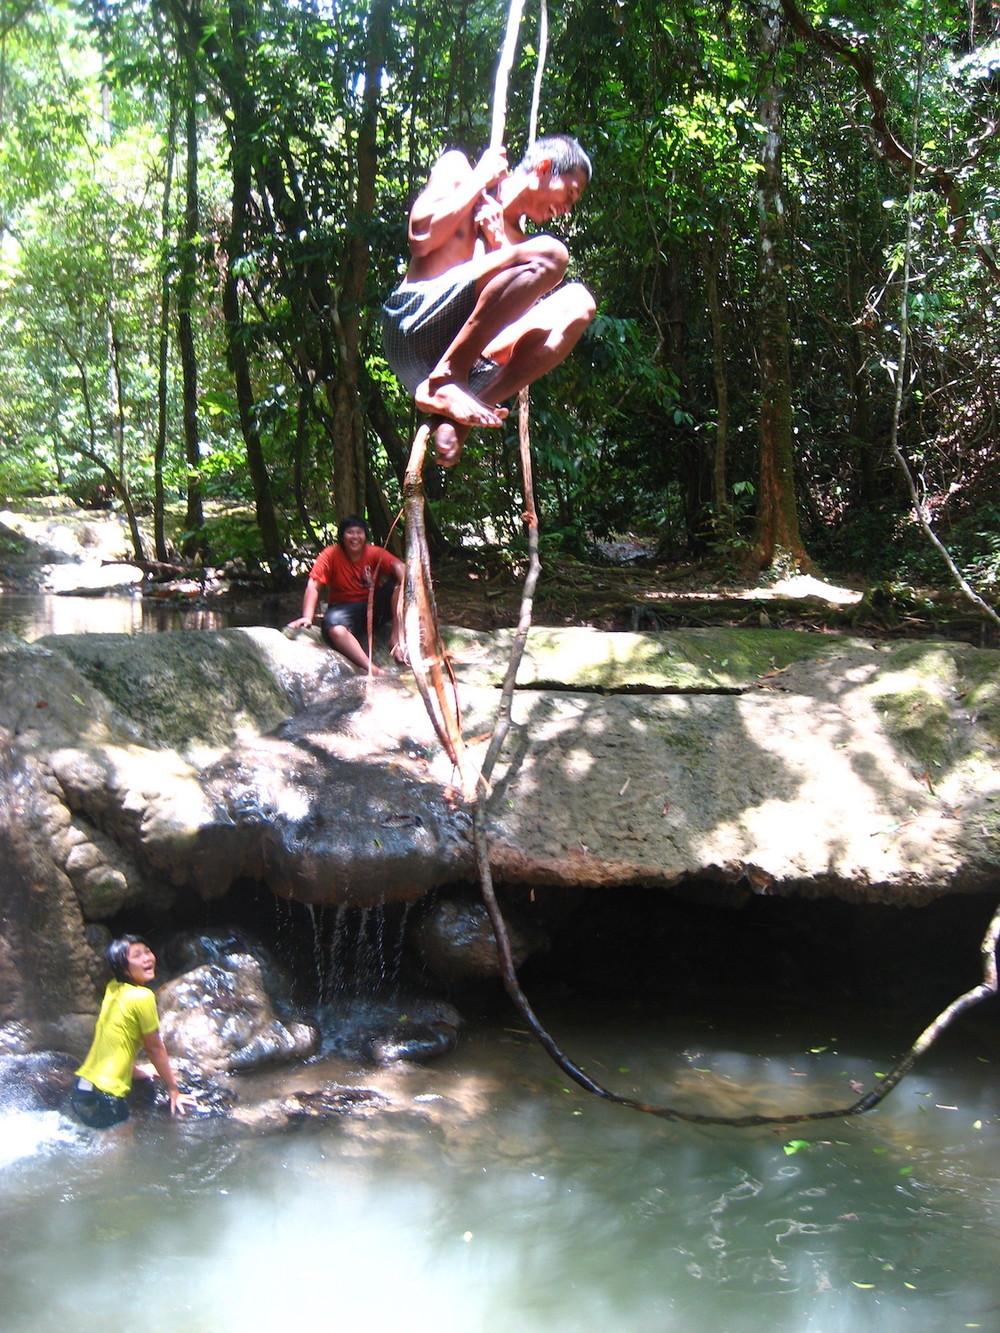 Pic: Local Thais enjoying bathing pools in Sa-Nang Manora Forest Park, Phang-Nga Province